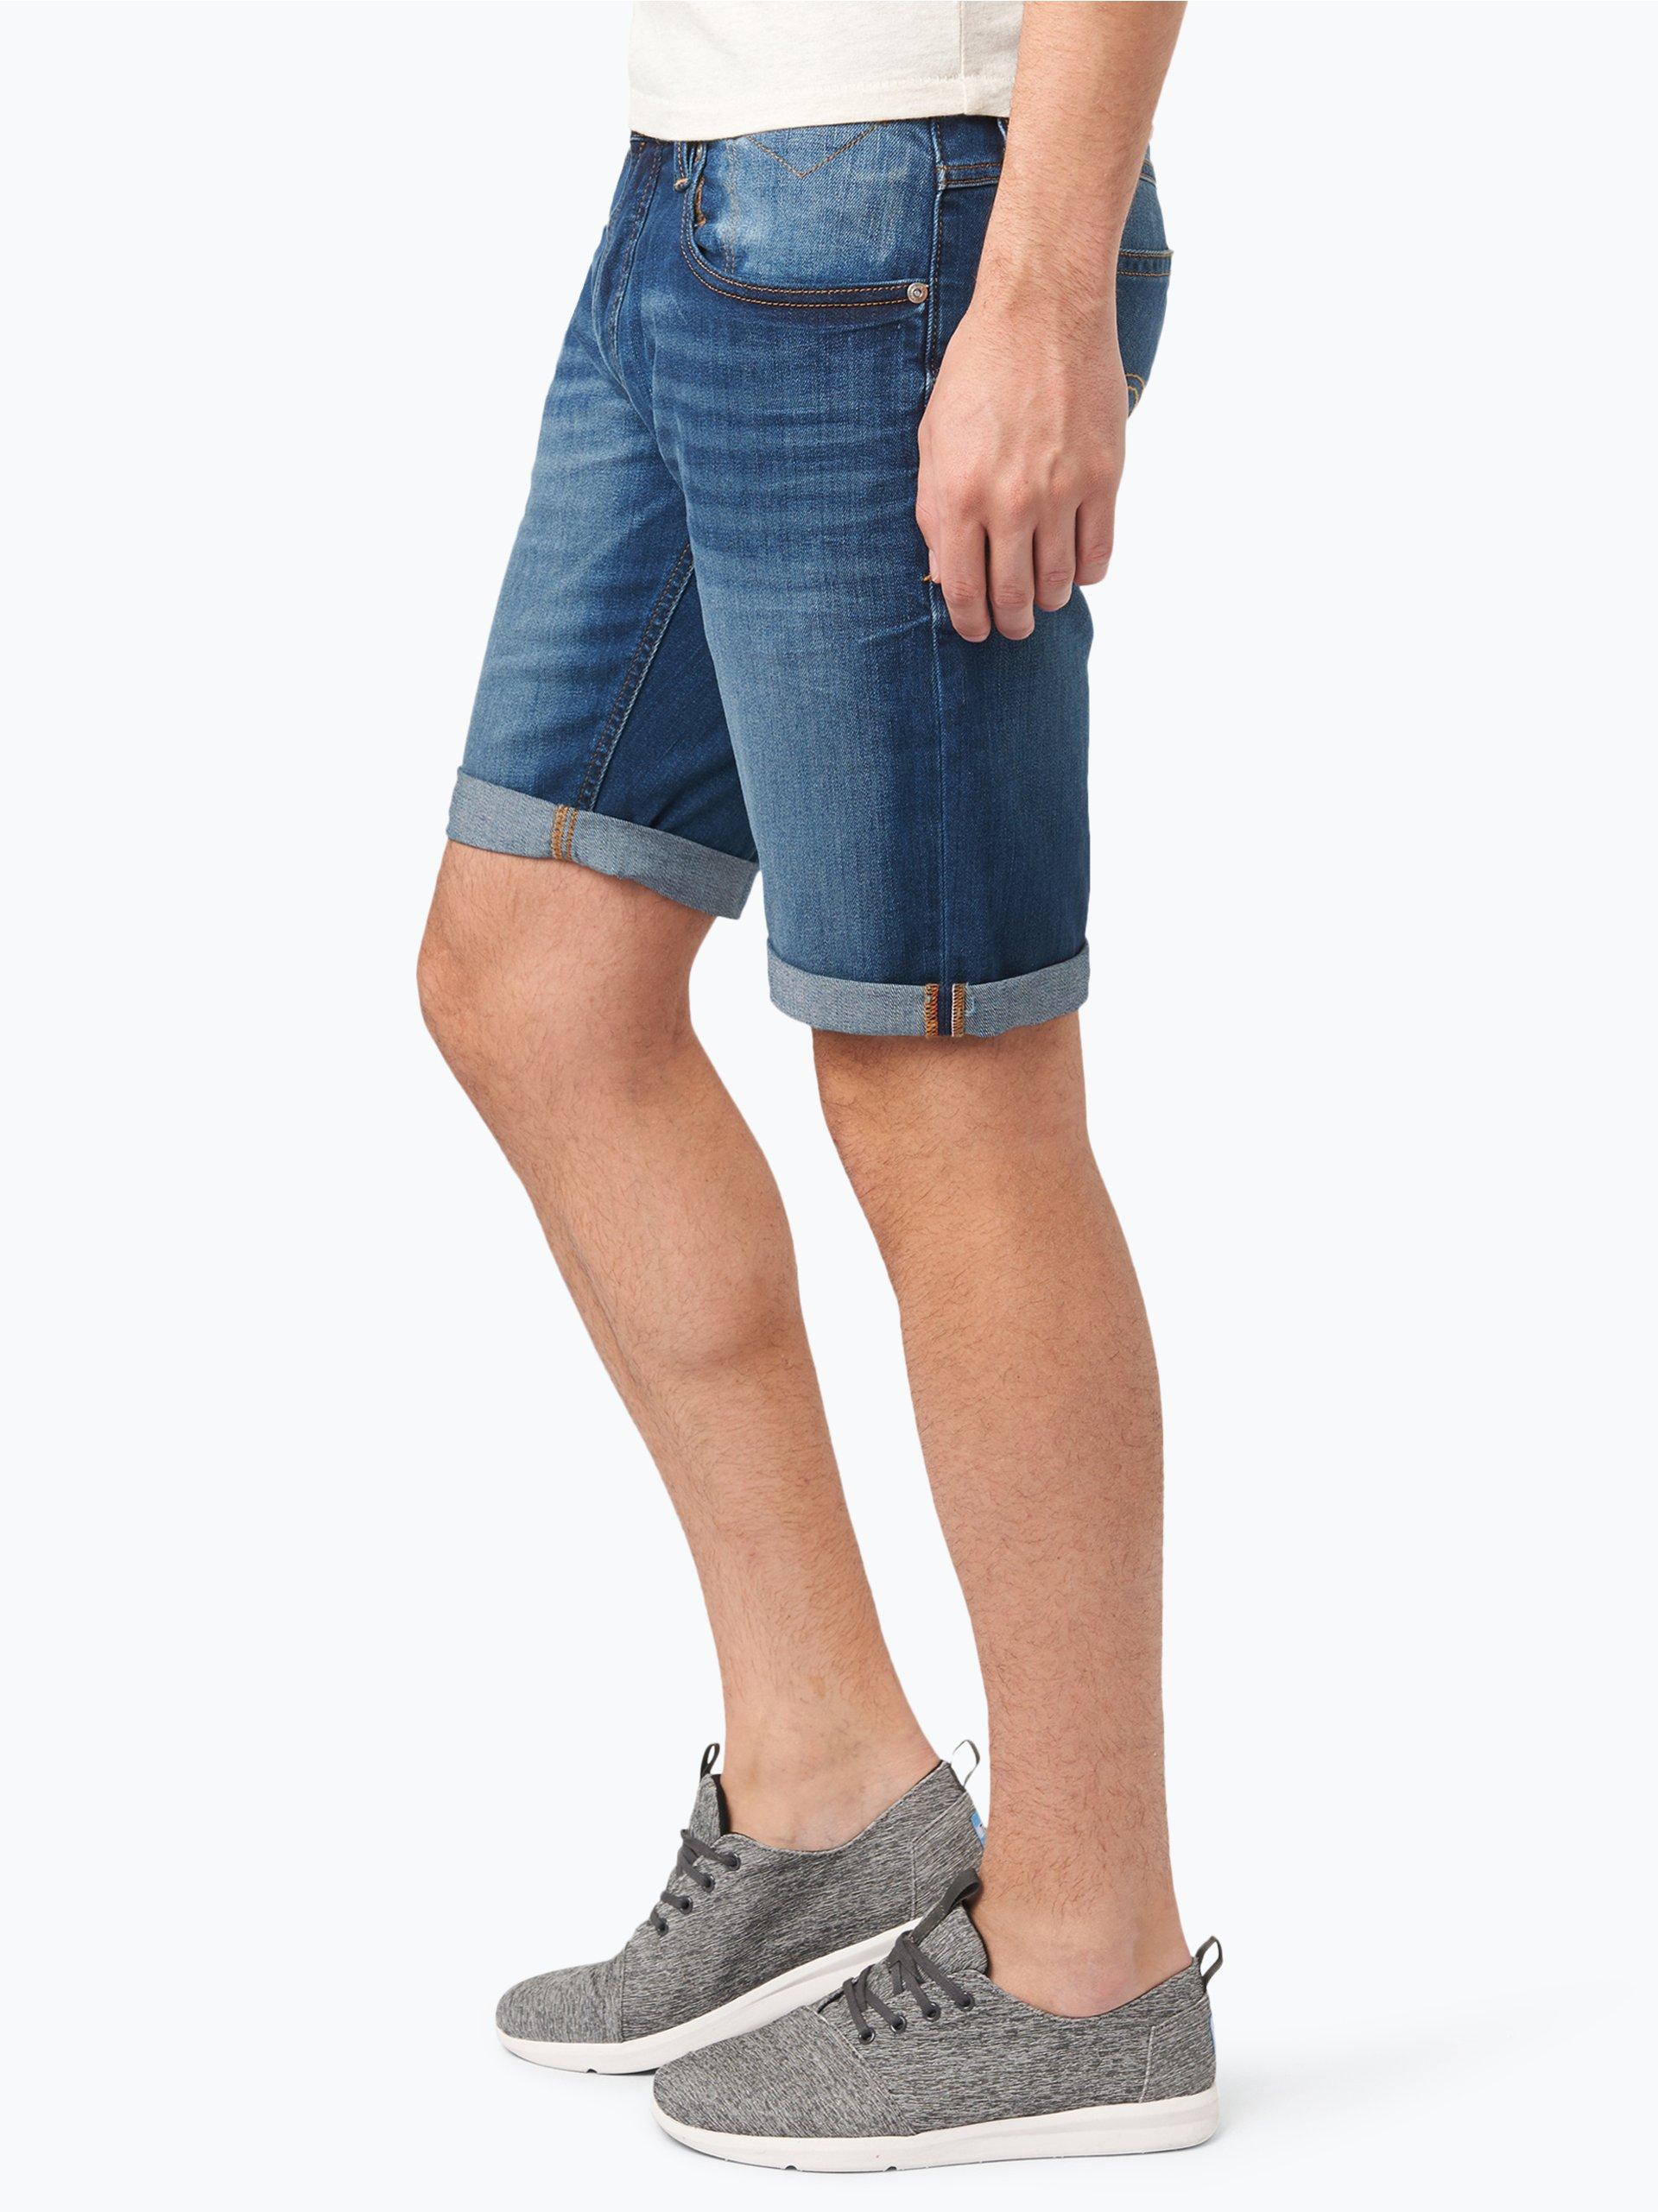 hilfiger denim herren jeans bermuda ronnie hellblau uni. Black Bedroom Furniture Sets. Home Design Ideas